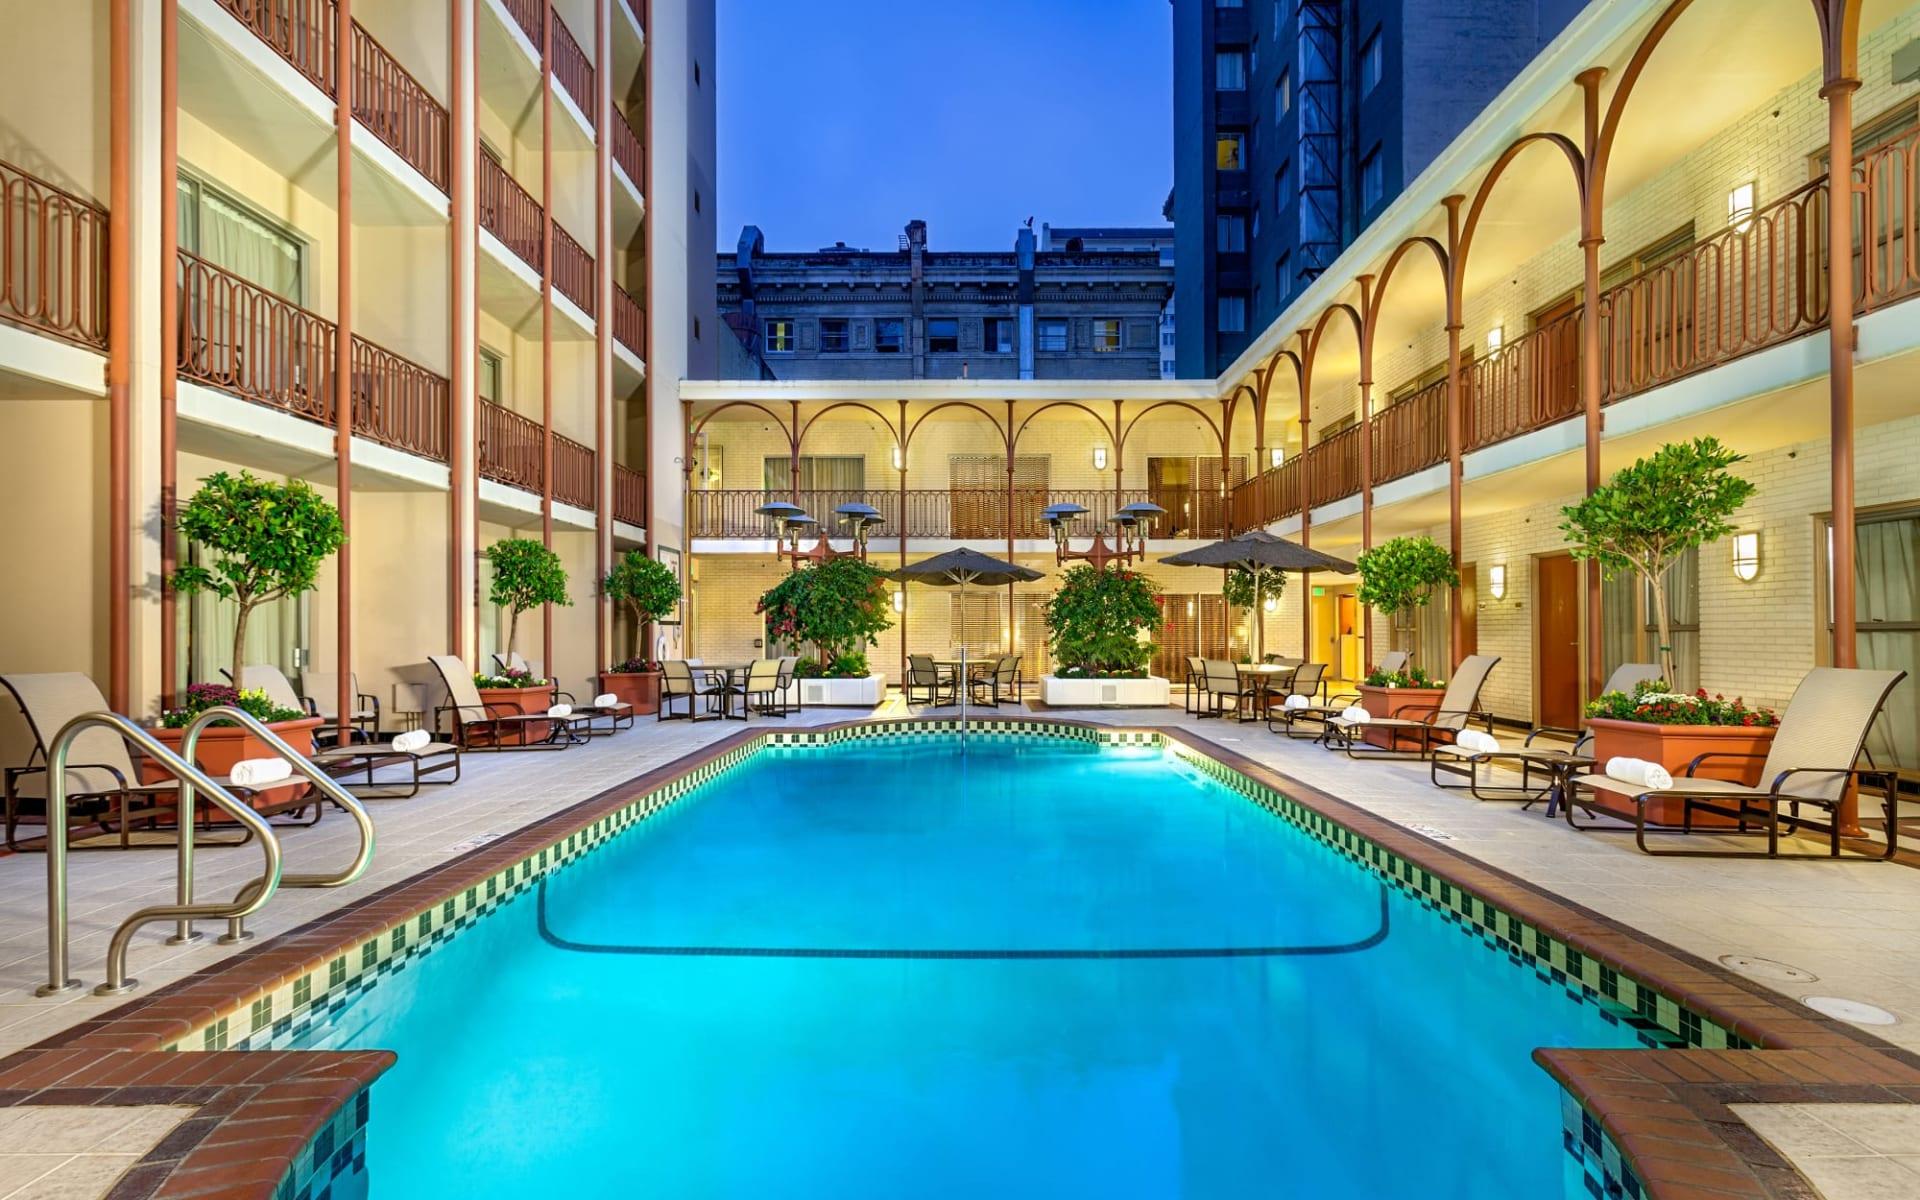 Handlery Union Square in San Francisco:  Handlery Union Square Hotel_Pool_BON